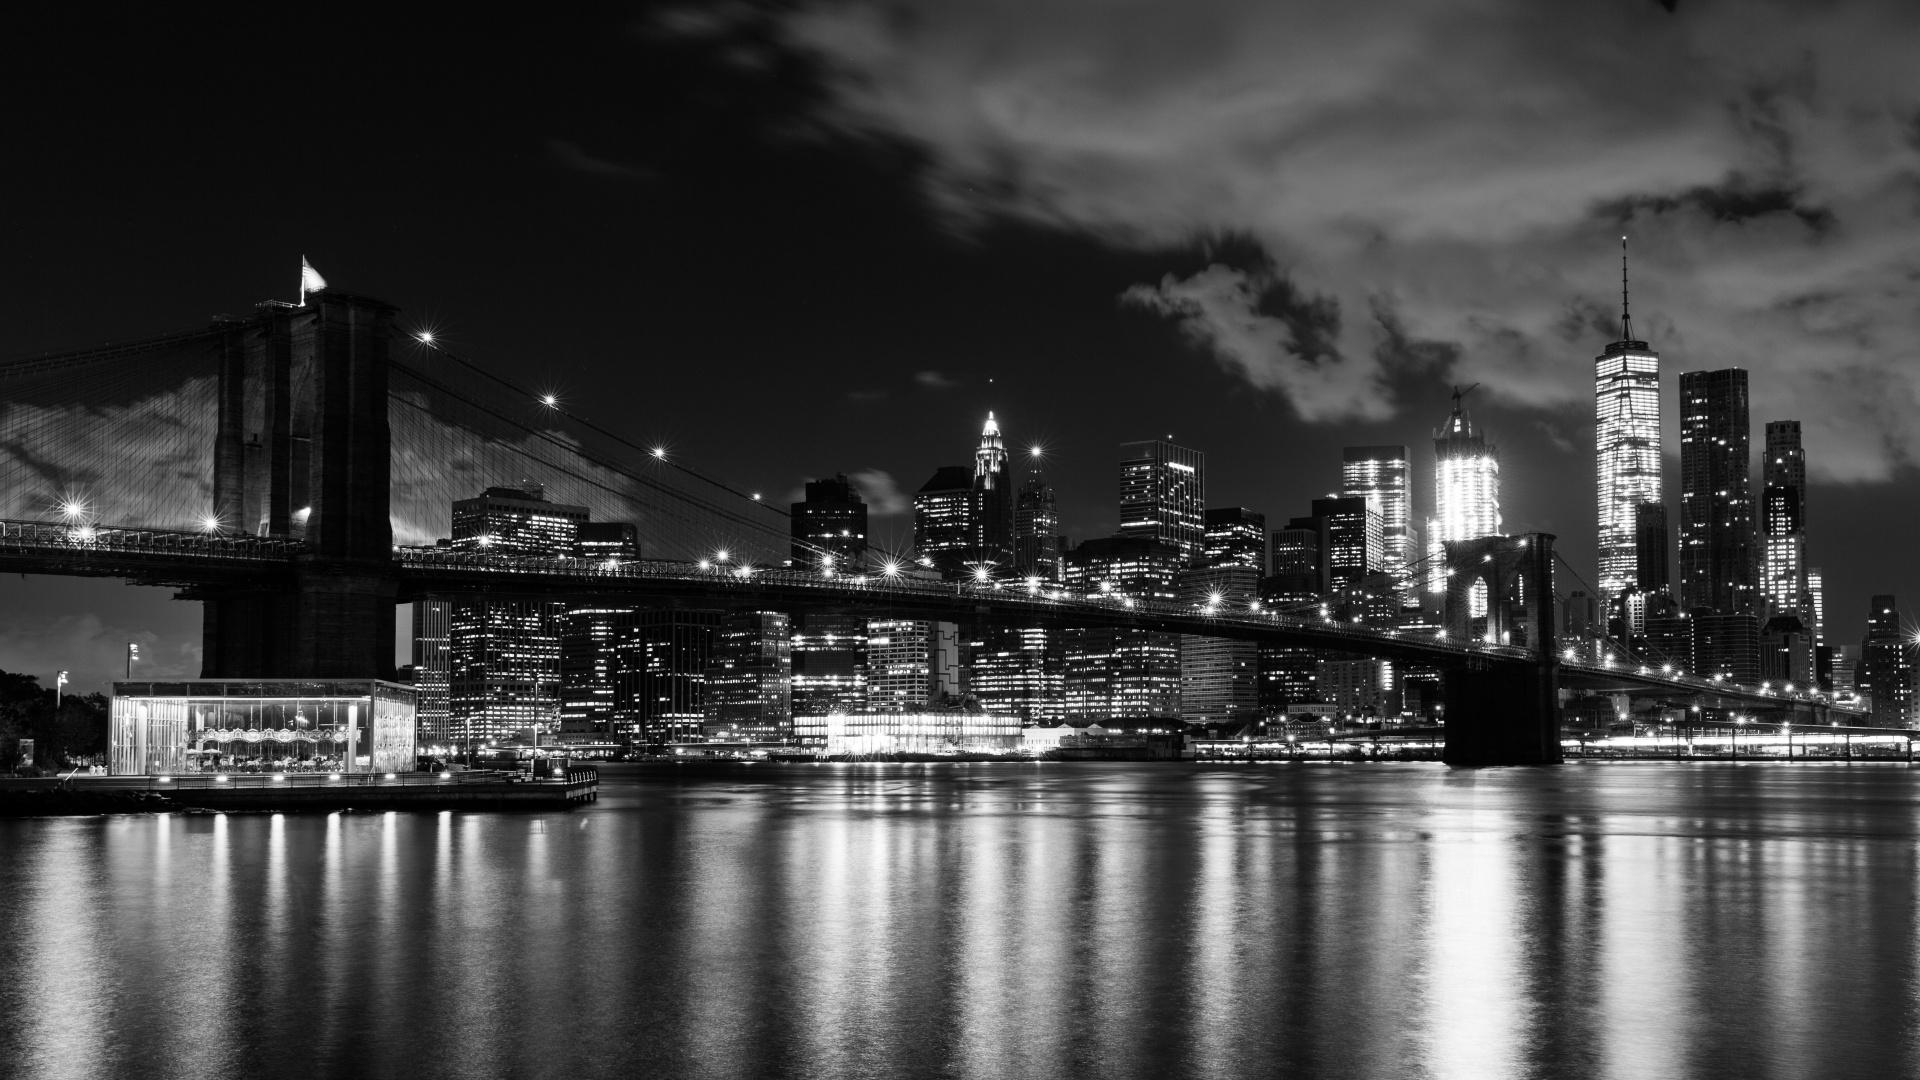 Acer Laptop Hd Wallpaper Download New York Night Skyline Free Stock Photo Public Domain